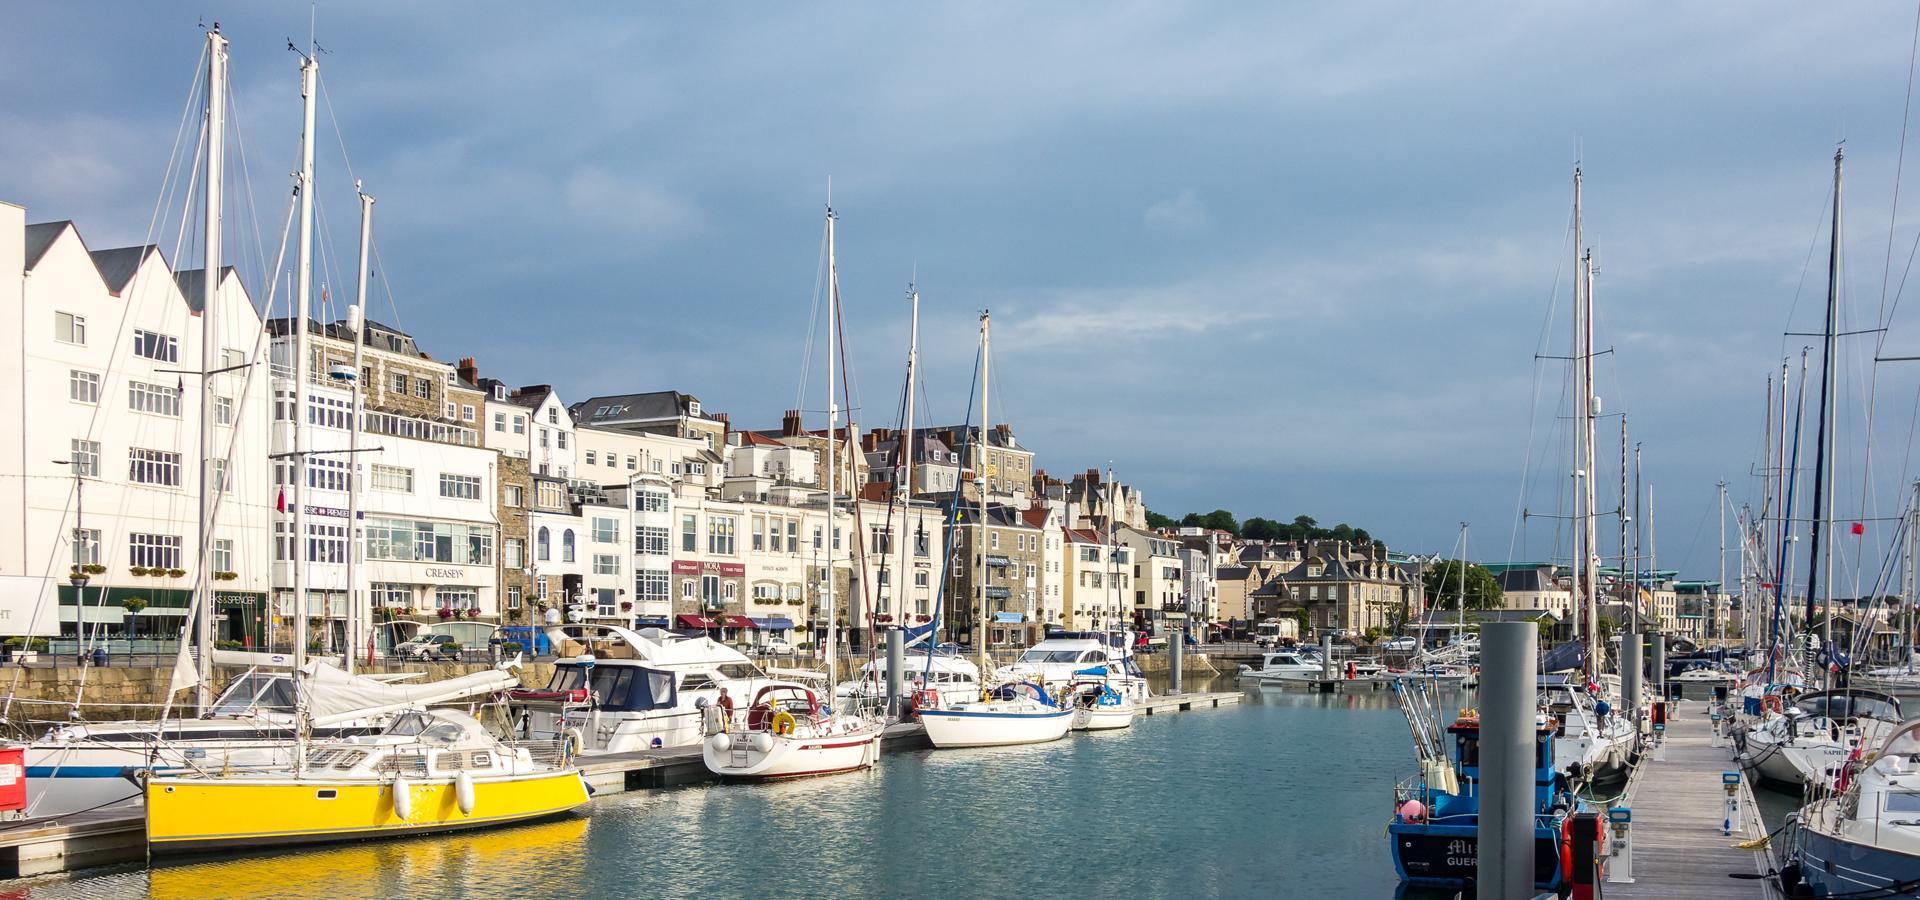 Peer-to-peer advisory in Guernsey, St Peter Port